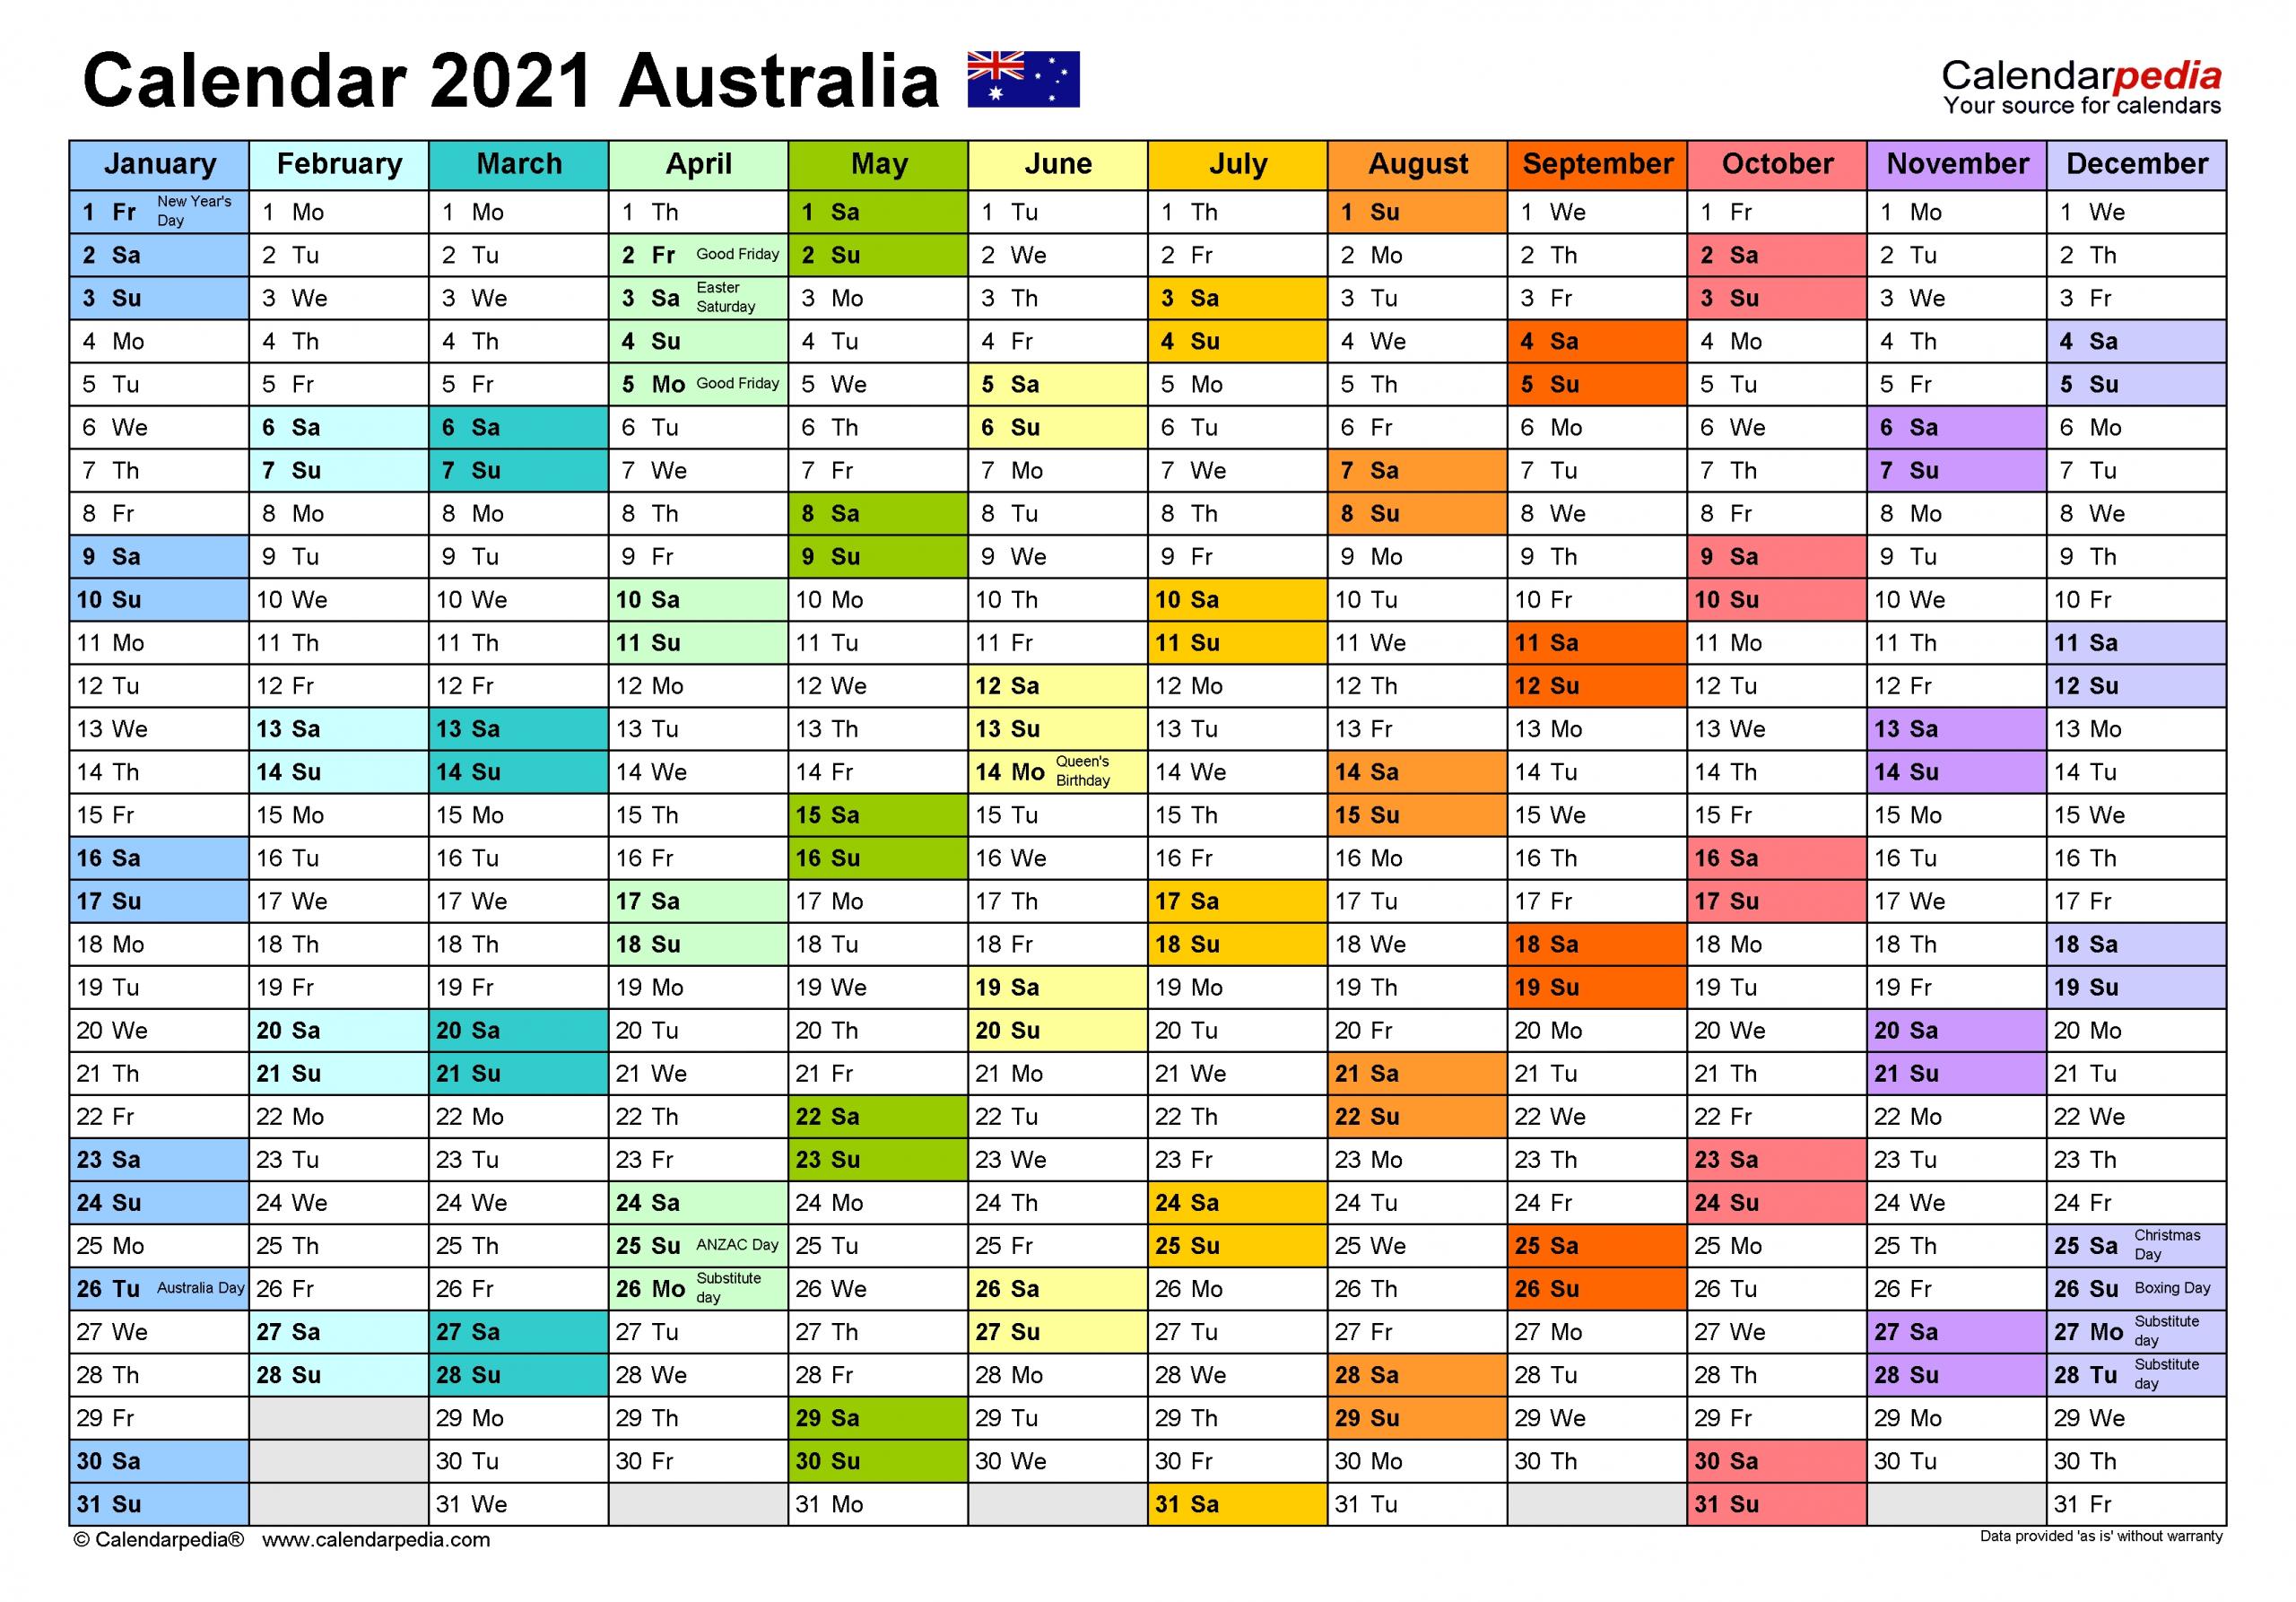 Australia Calendar 2021 - Free Printable Pdf Templates  2021 To 2021 Financial Year Calender Australia